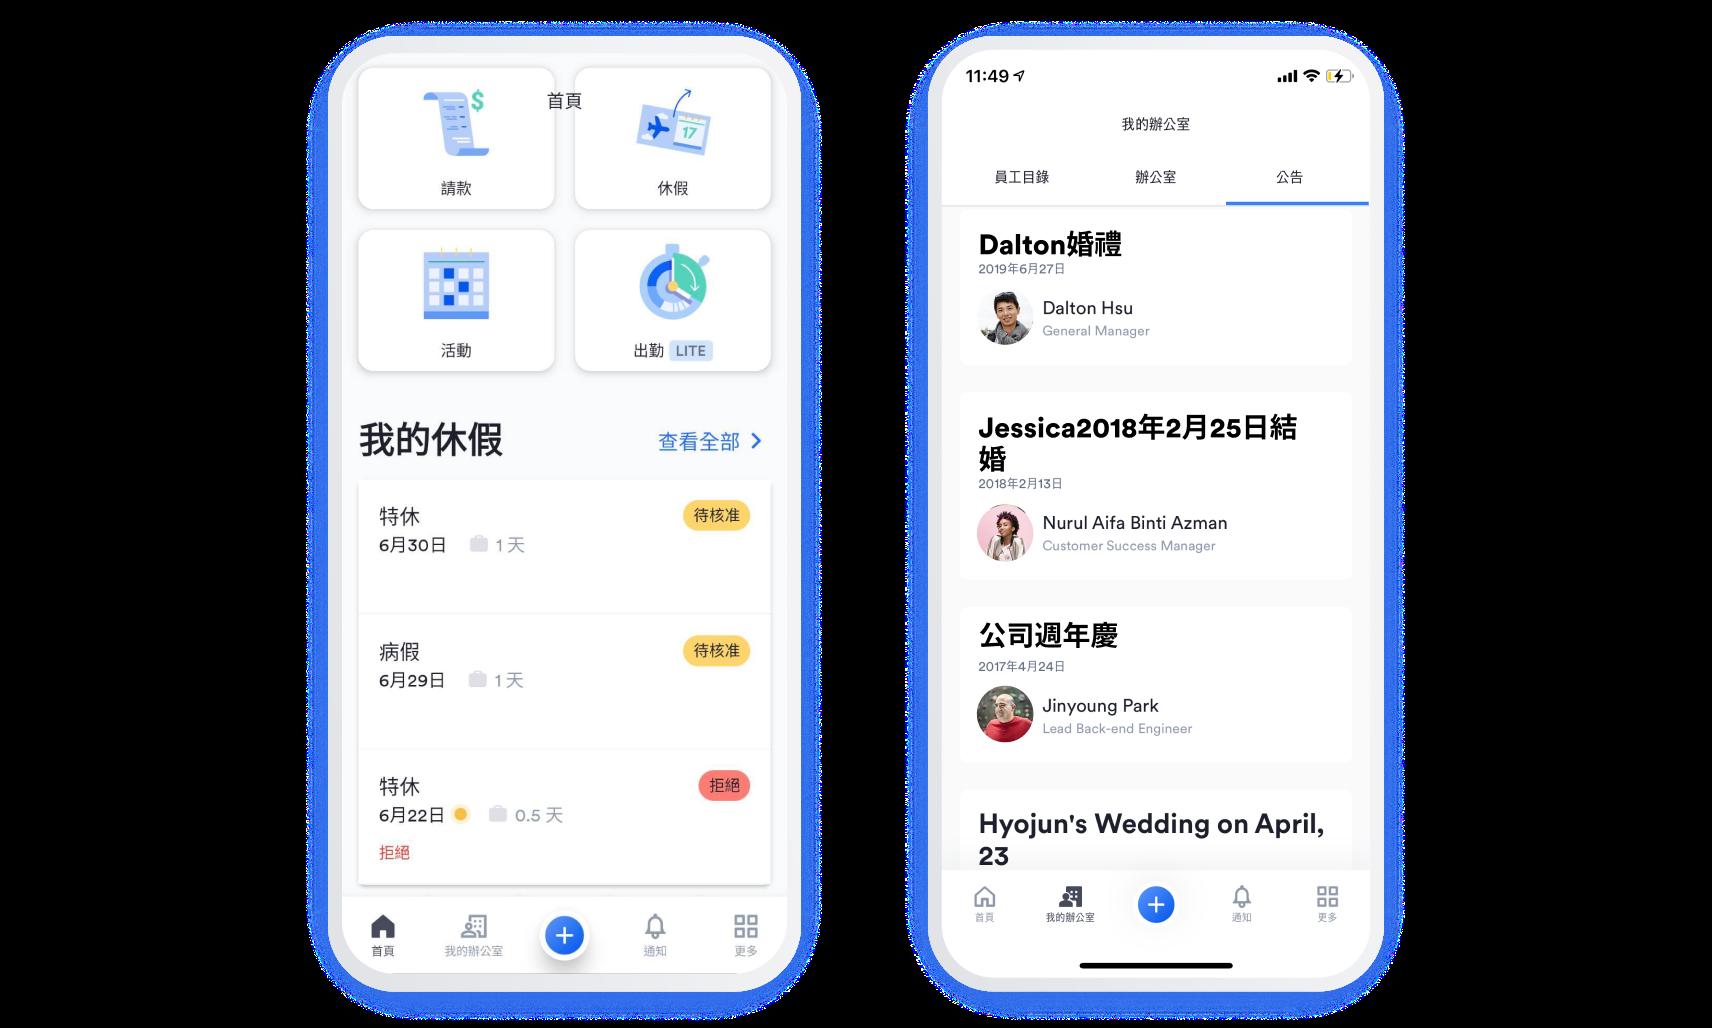 Swingvy手機App支援iOS與Android,不但讓你即時收到訊息,還能輕鬆管理休假與出勤,還能讓手機成為你的打卡鐘!!